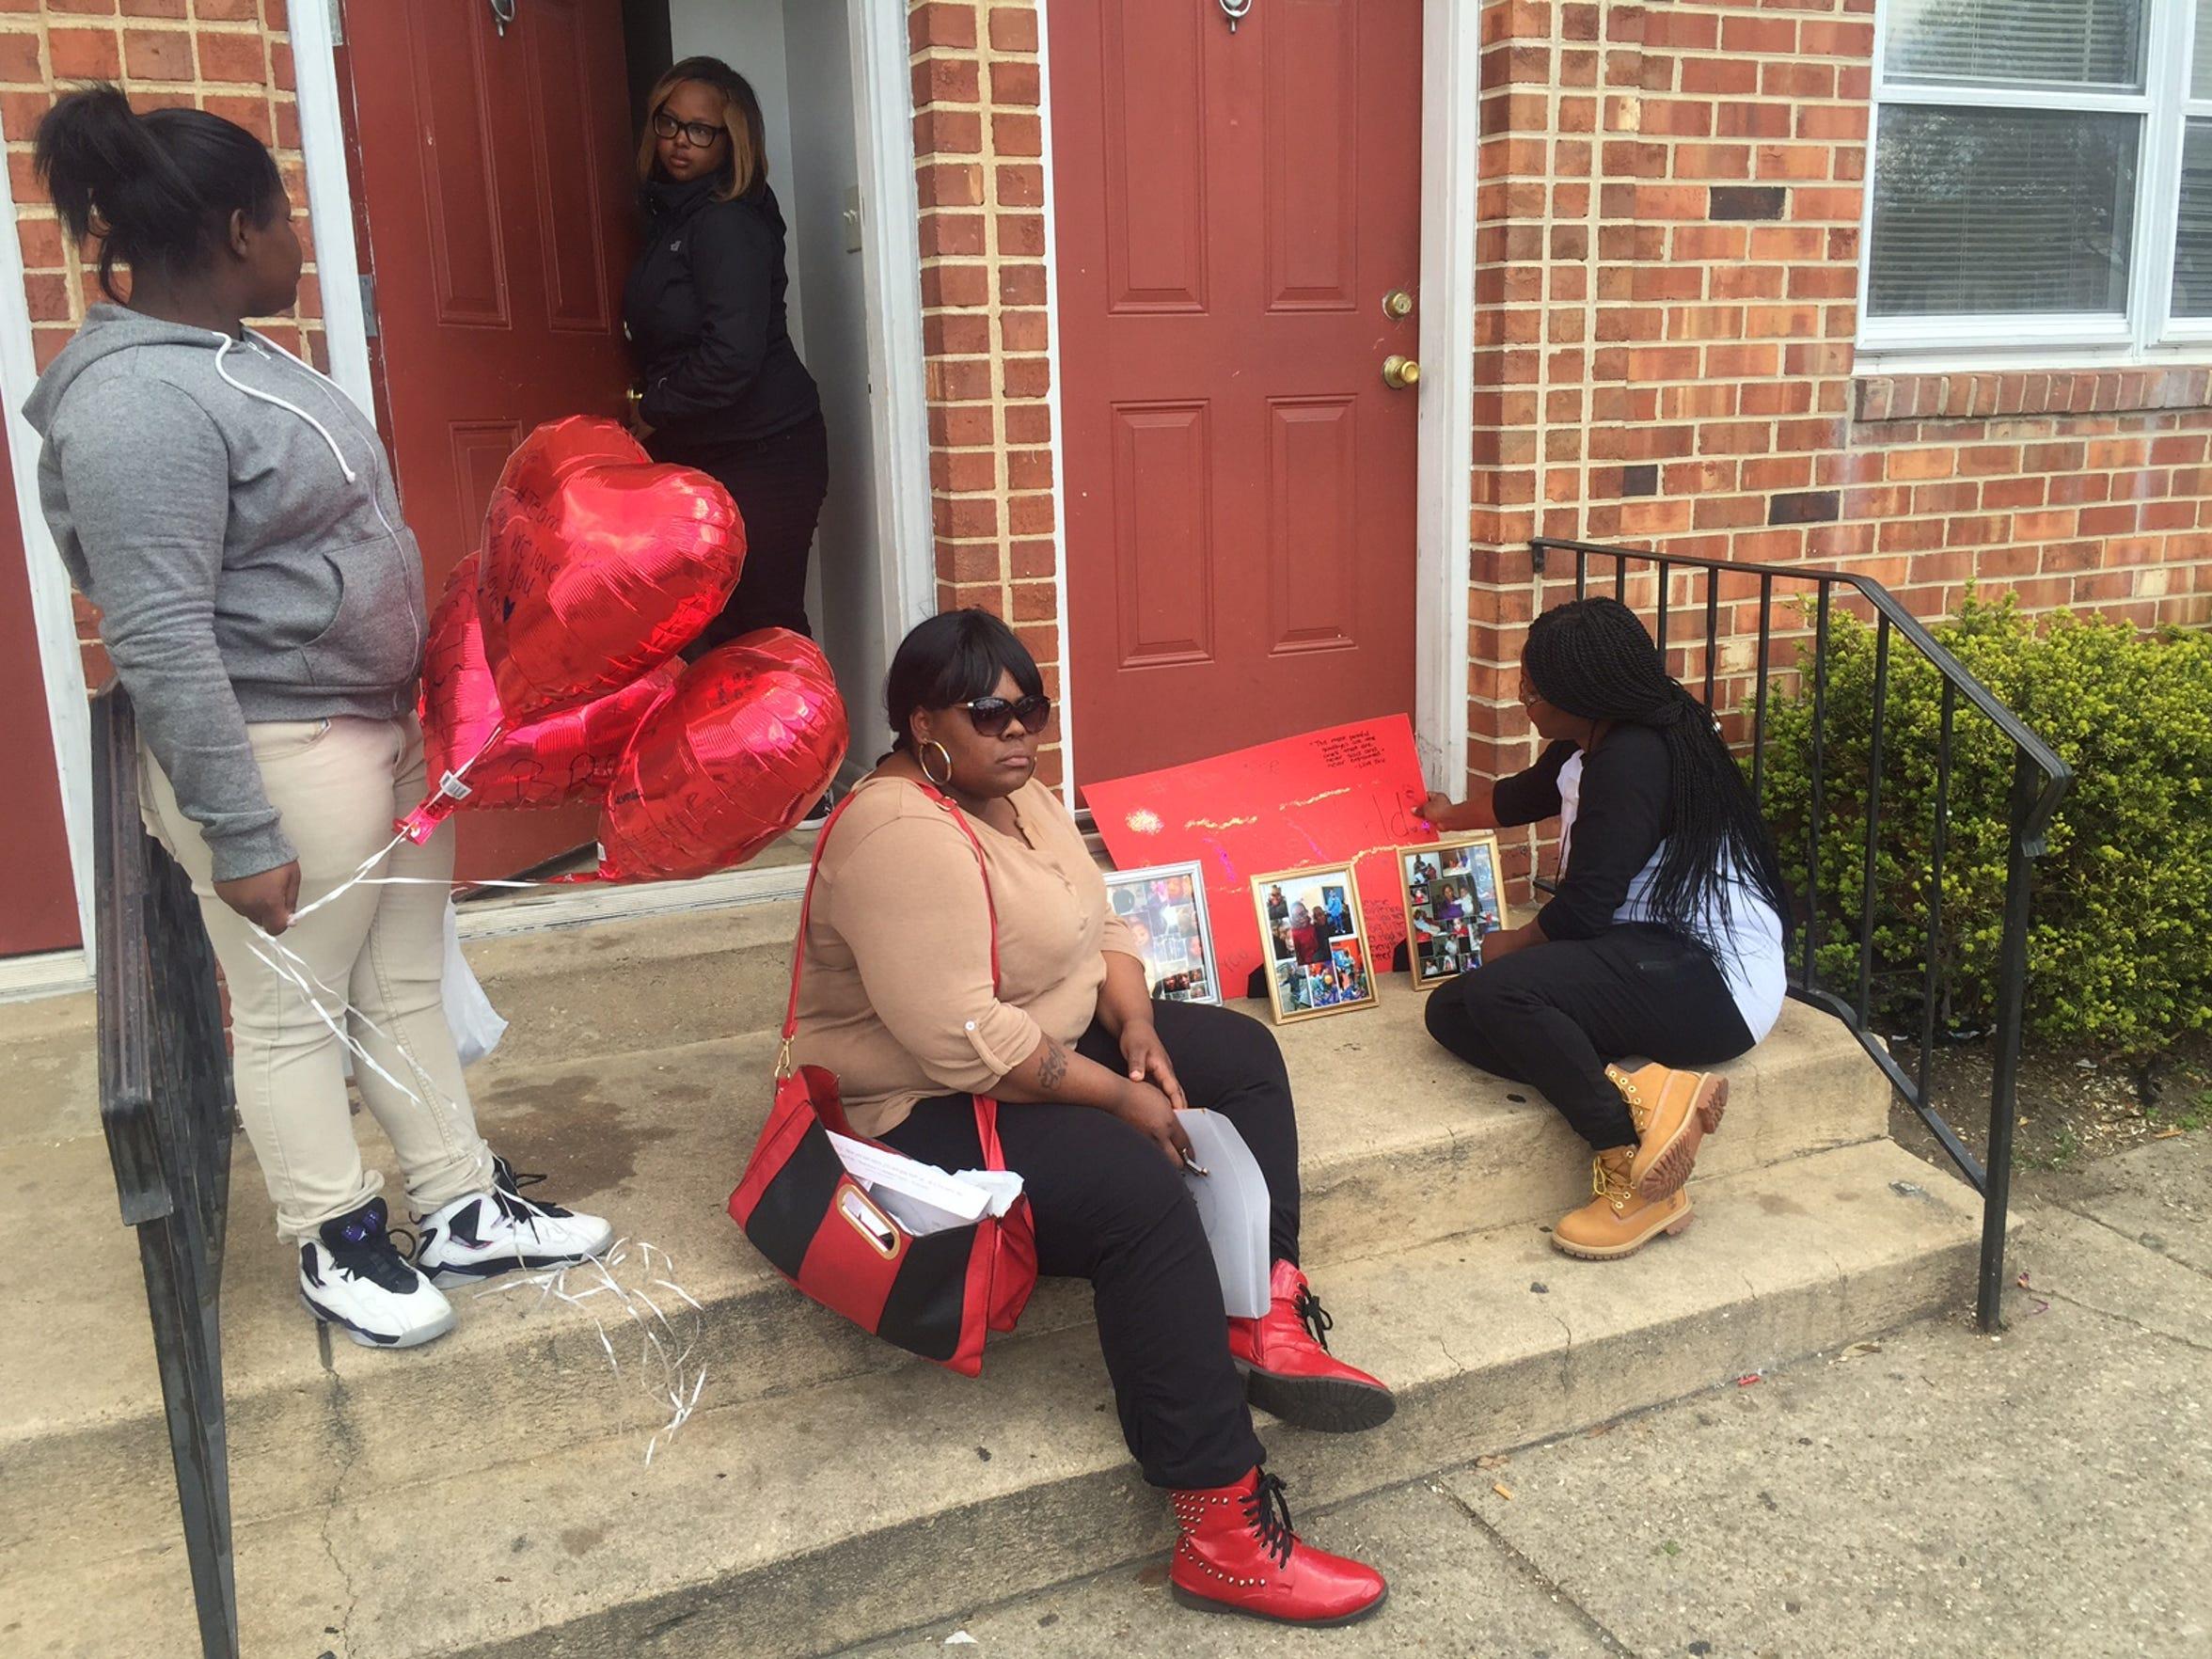 Relatives of fatal shooting victim Arteise Brown set